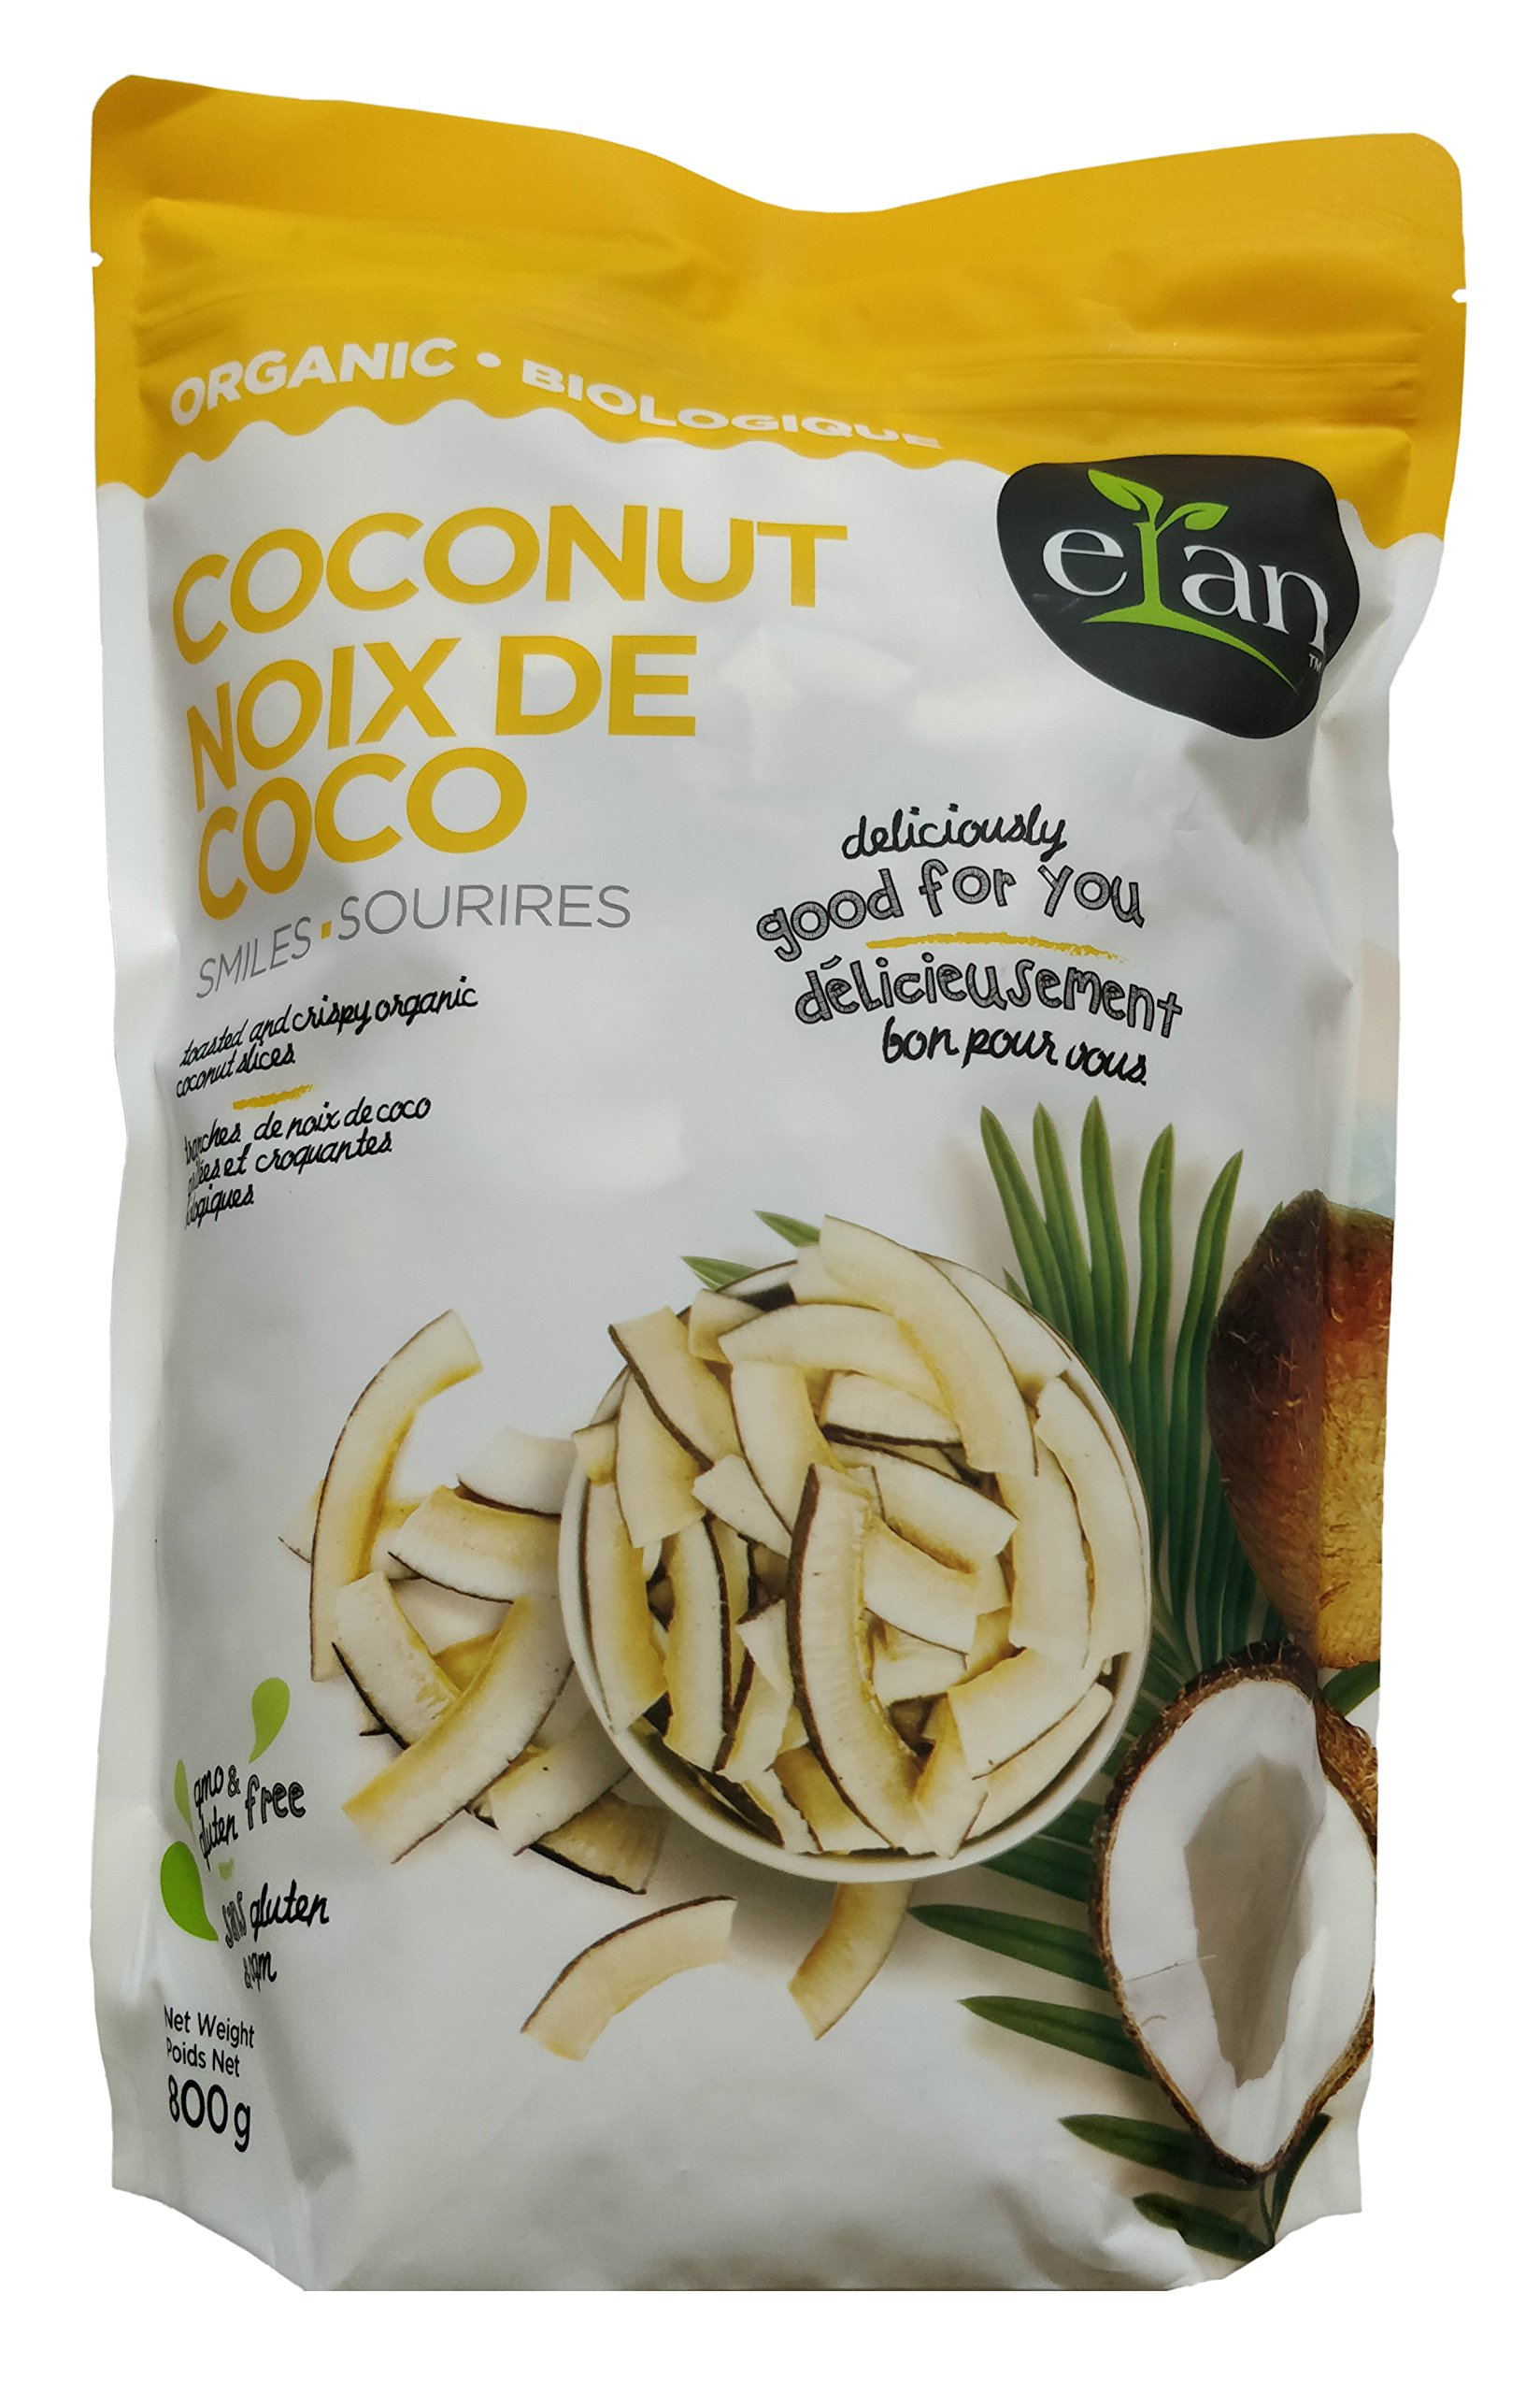 Elan Organic Coconut Smiles 800g, Vegan, Organic, Gluten & GMO Free. ''Deliciously Good For You''